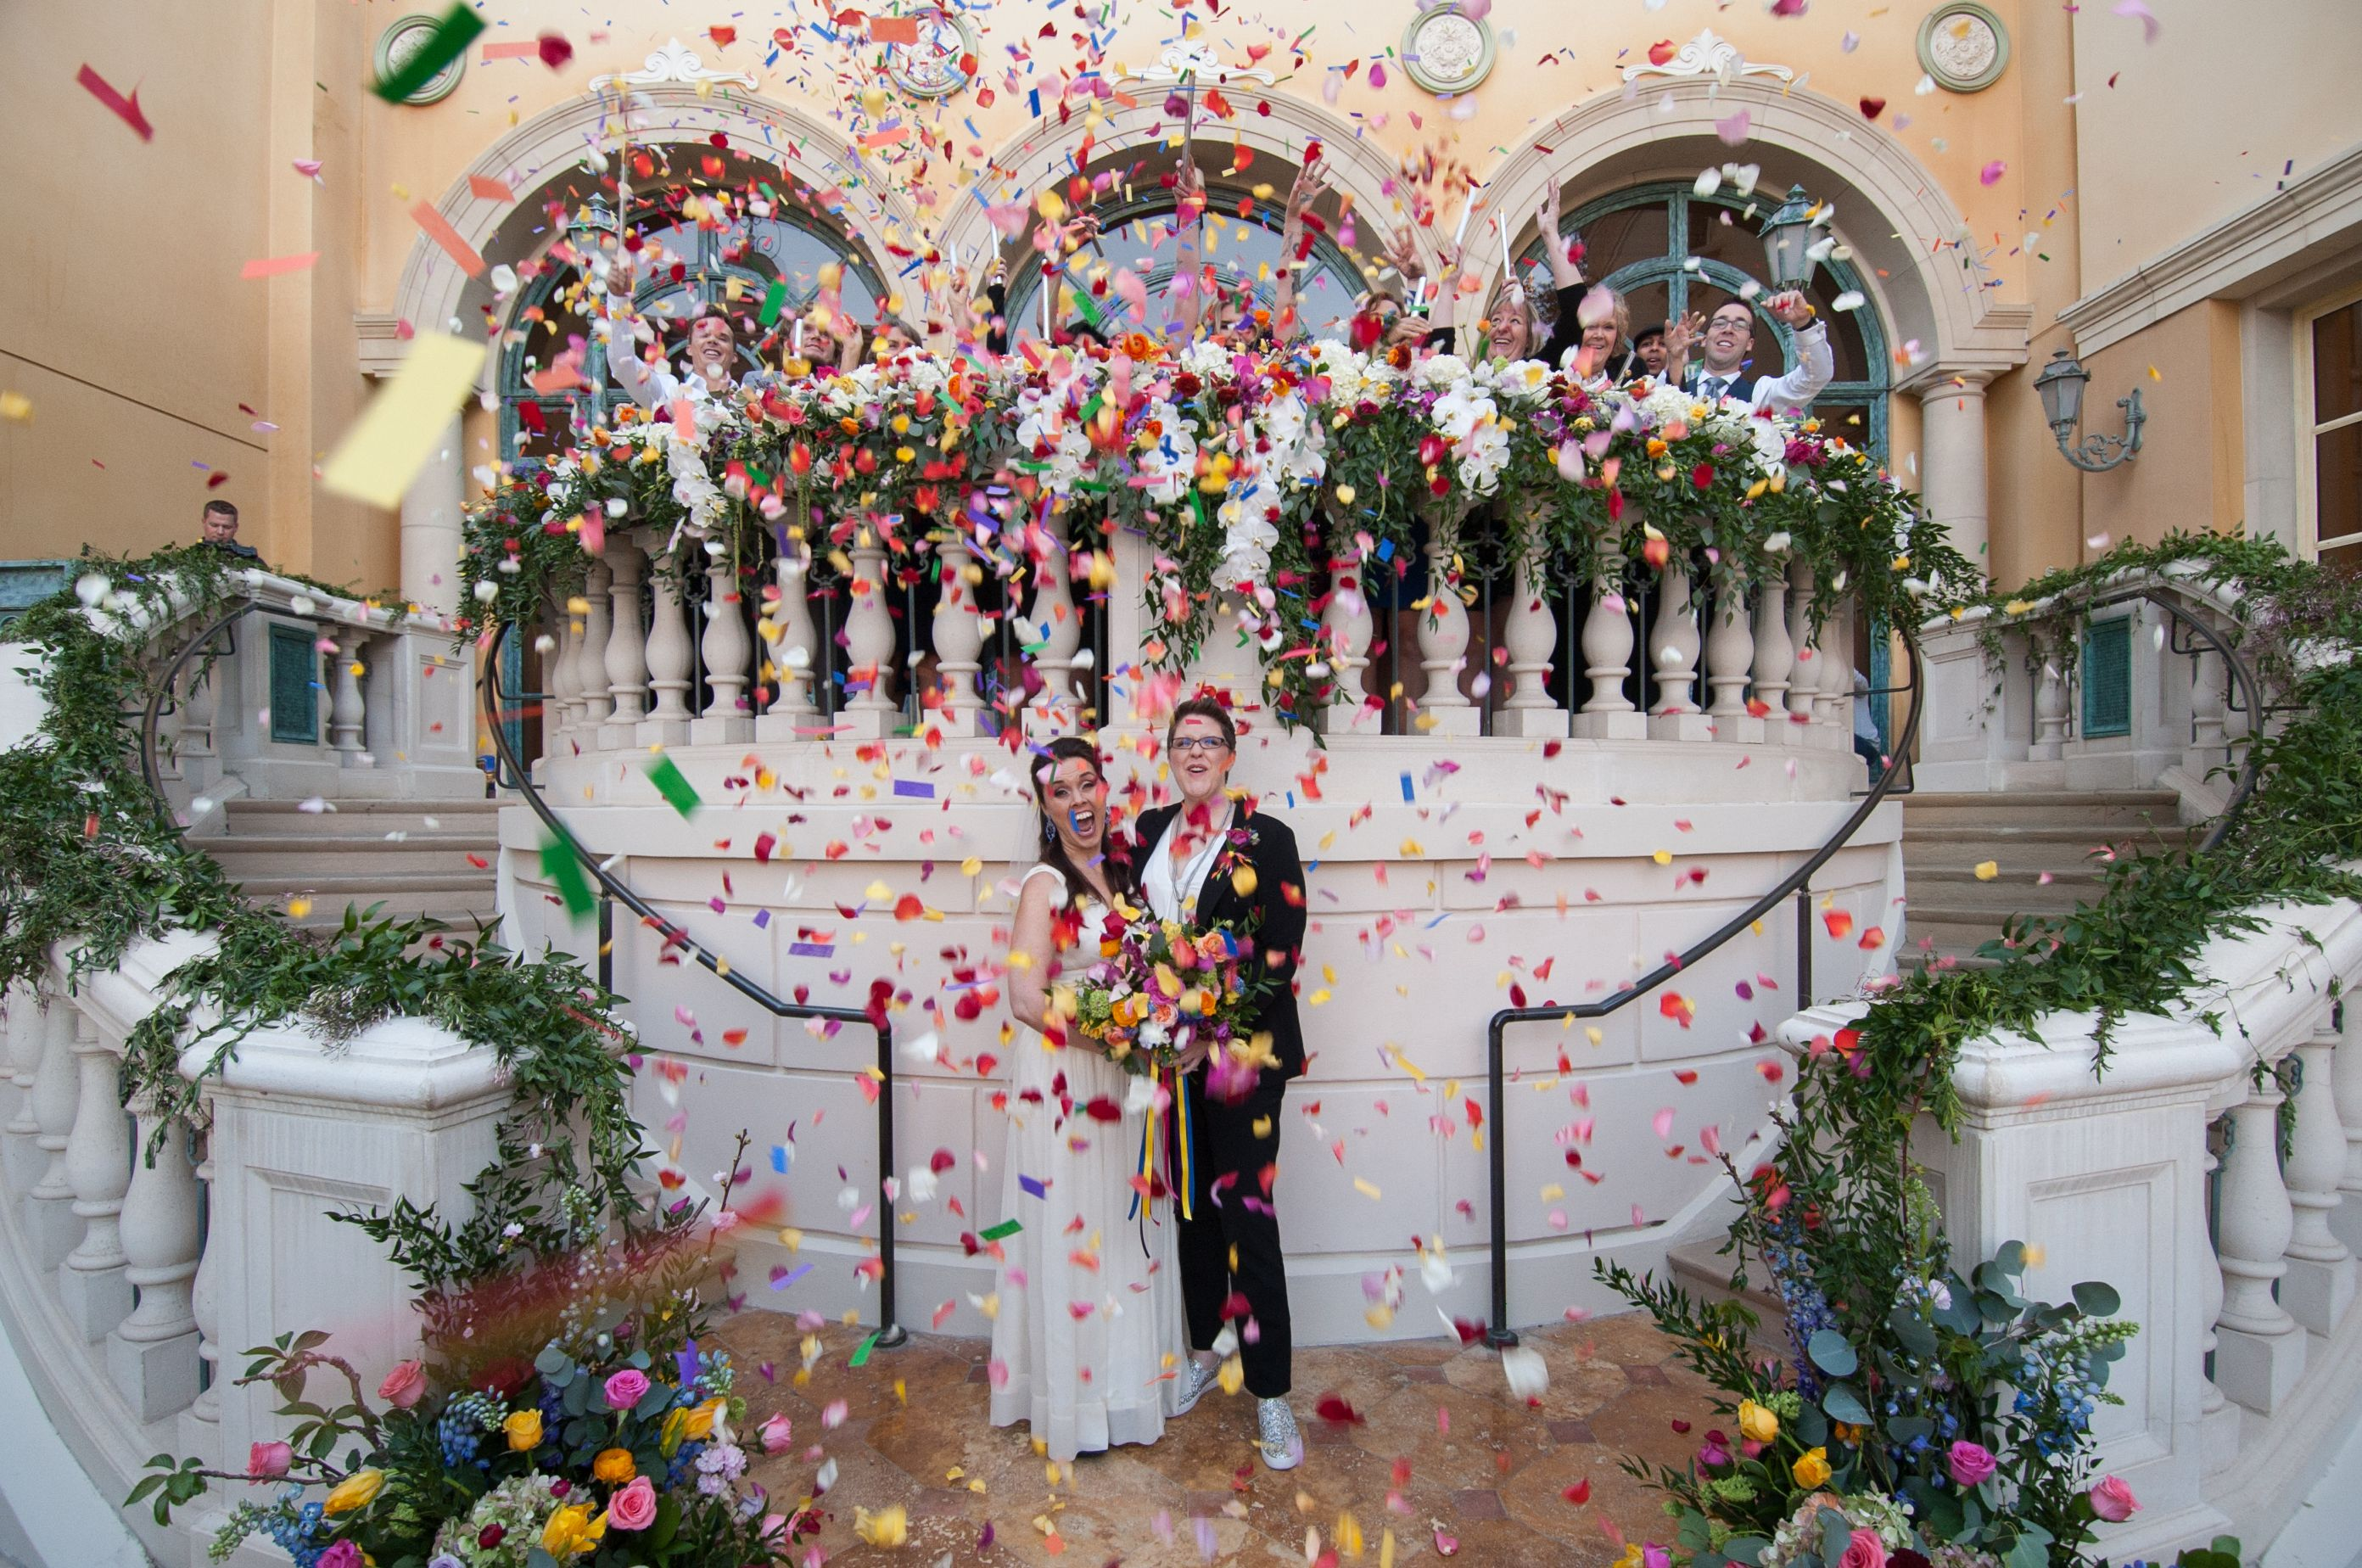 Lesbian Wedding Inspiration Las Vegas Lgbtq Wedding At Bellagio Las Vegas Las Vegas Wedding Inspiration Bellagio Las Vegas Vegas Wedding